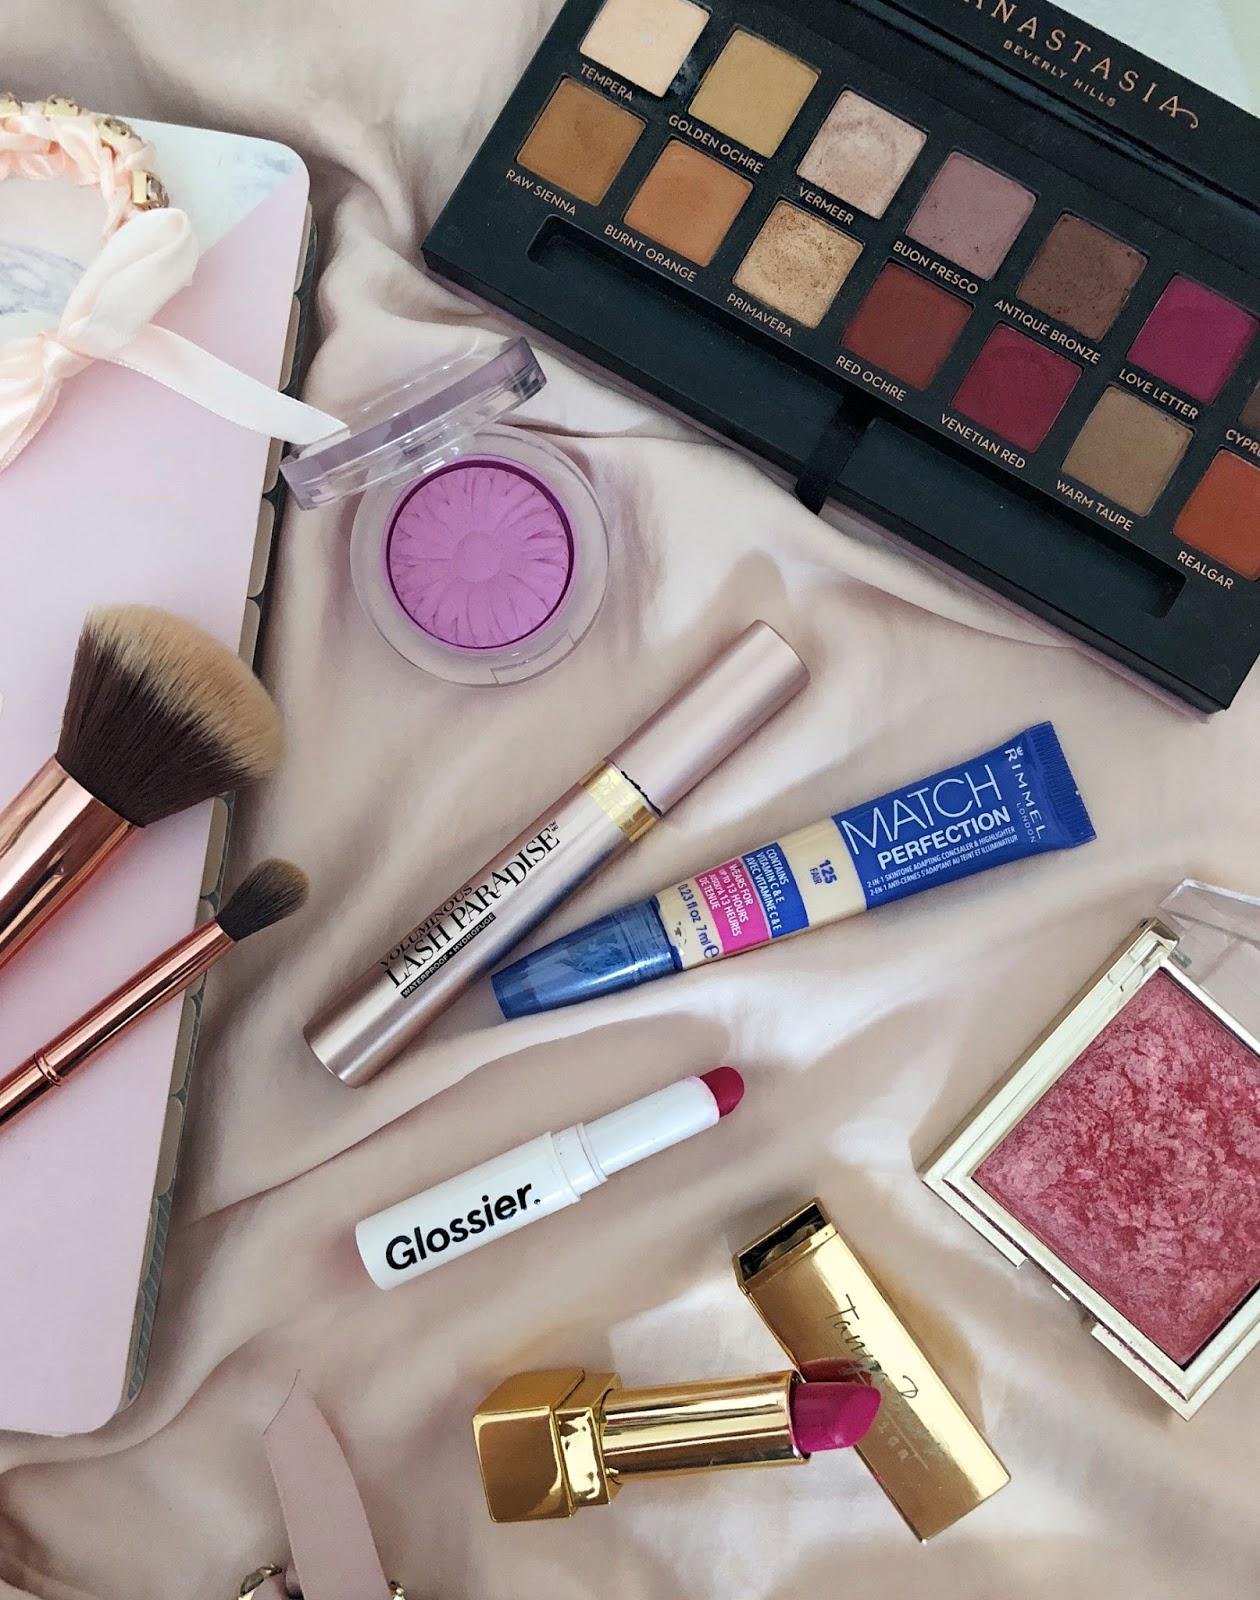 best of beauty 2017 modern renaissance tanya burr mascara brush zoeva glossier loreal clinique makeup beauty bblogger canadian blogger fashion fblogger favourites favorites